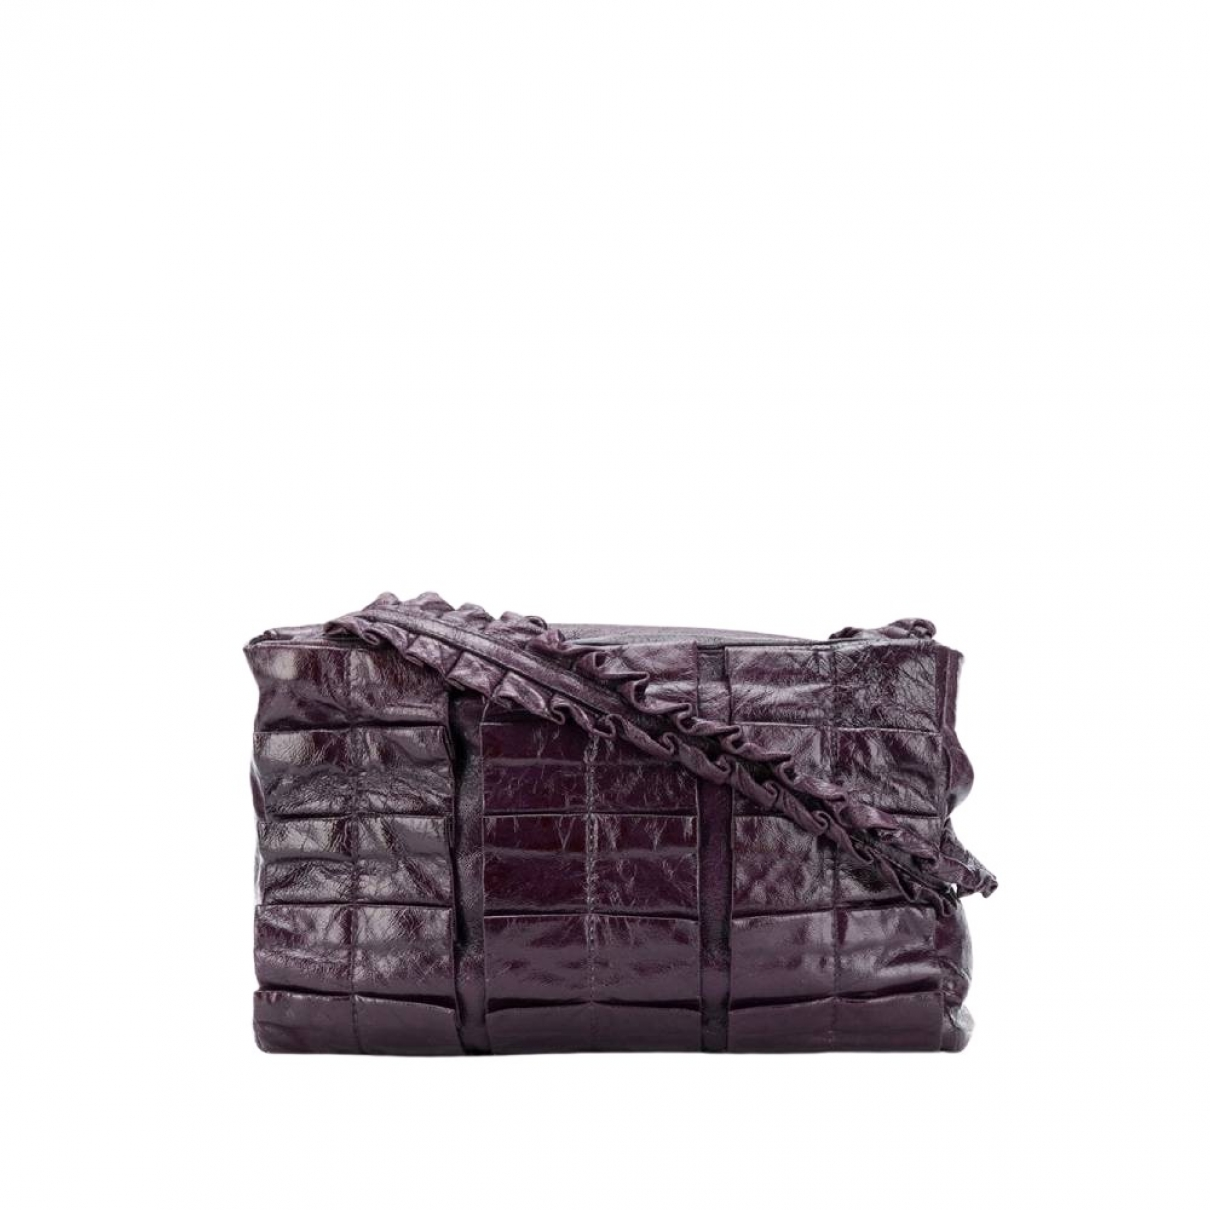 Miu Miu \N Handtasche in  Lila Leder